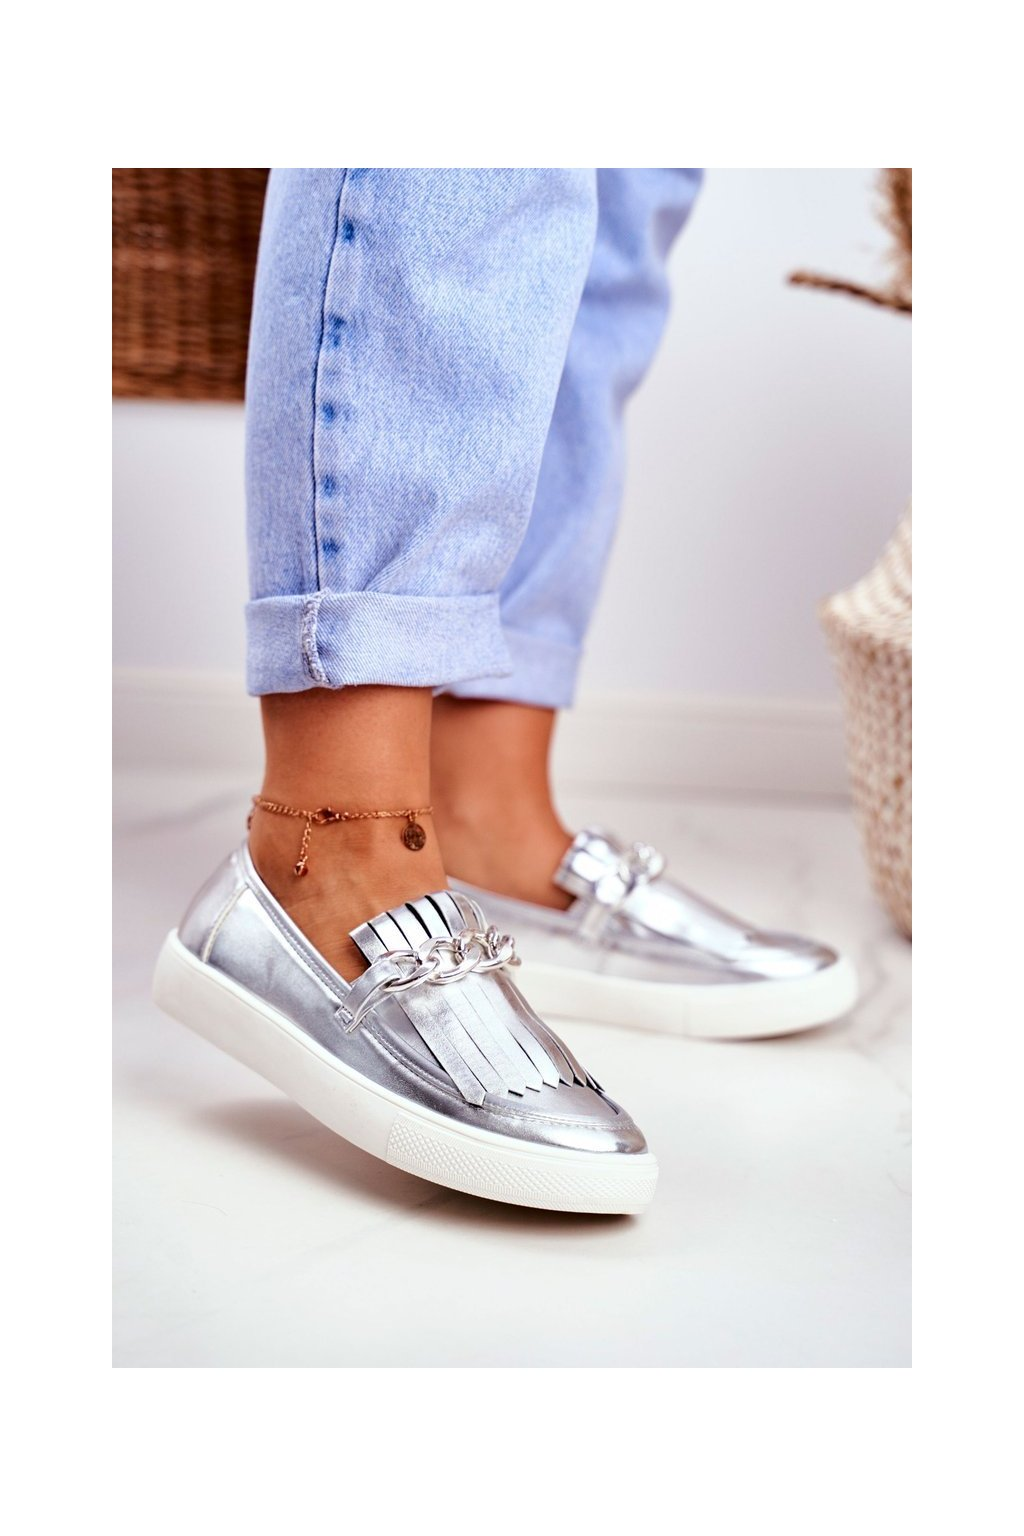 Dámske tenisky slip on farba sivá kód obuvi XW50012 SILVER PU